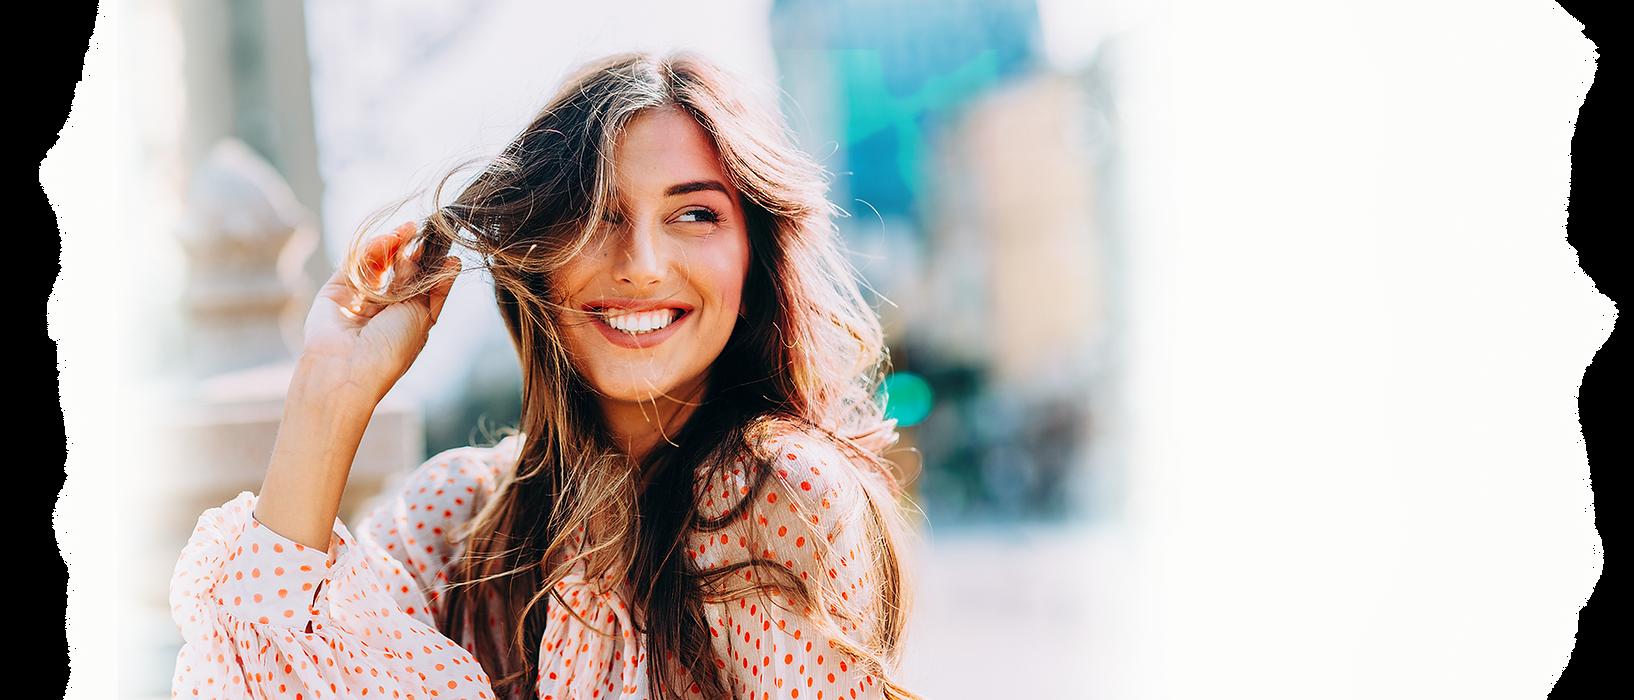 Beautiful woman smiling in polka-dot blouse